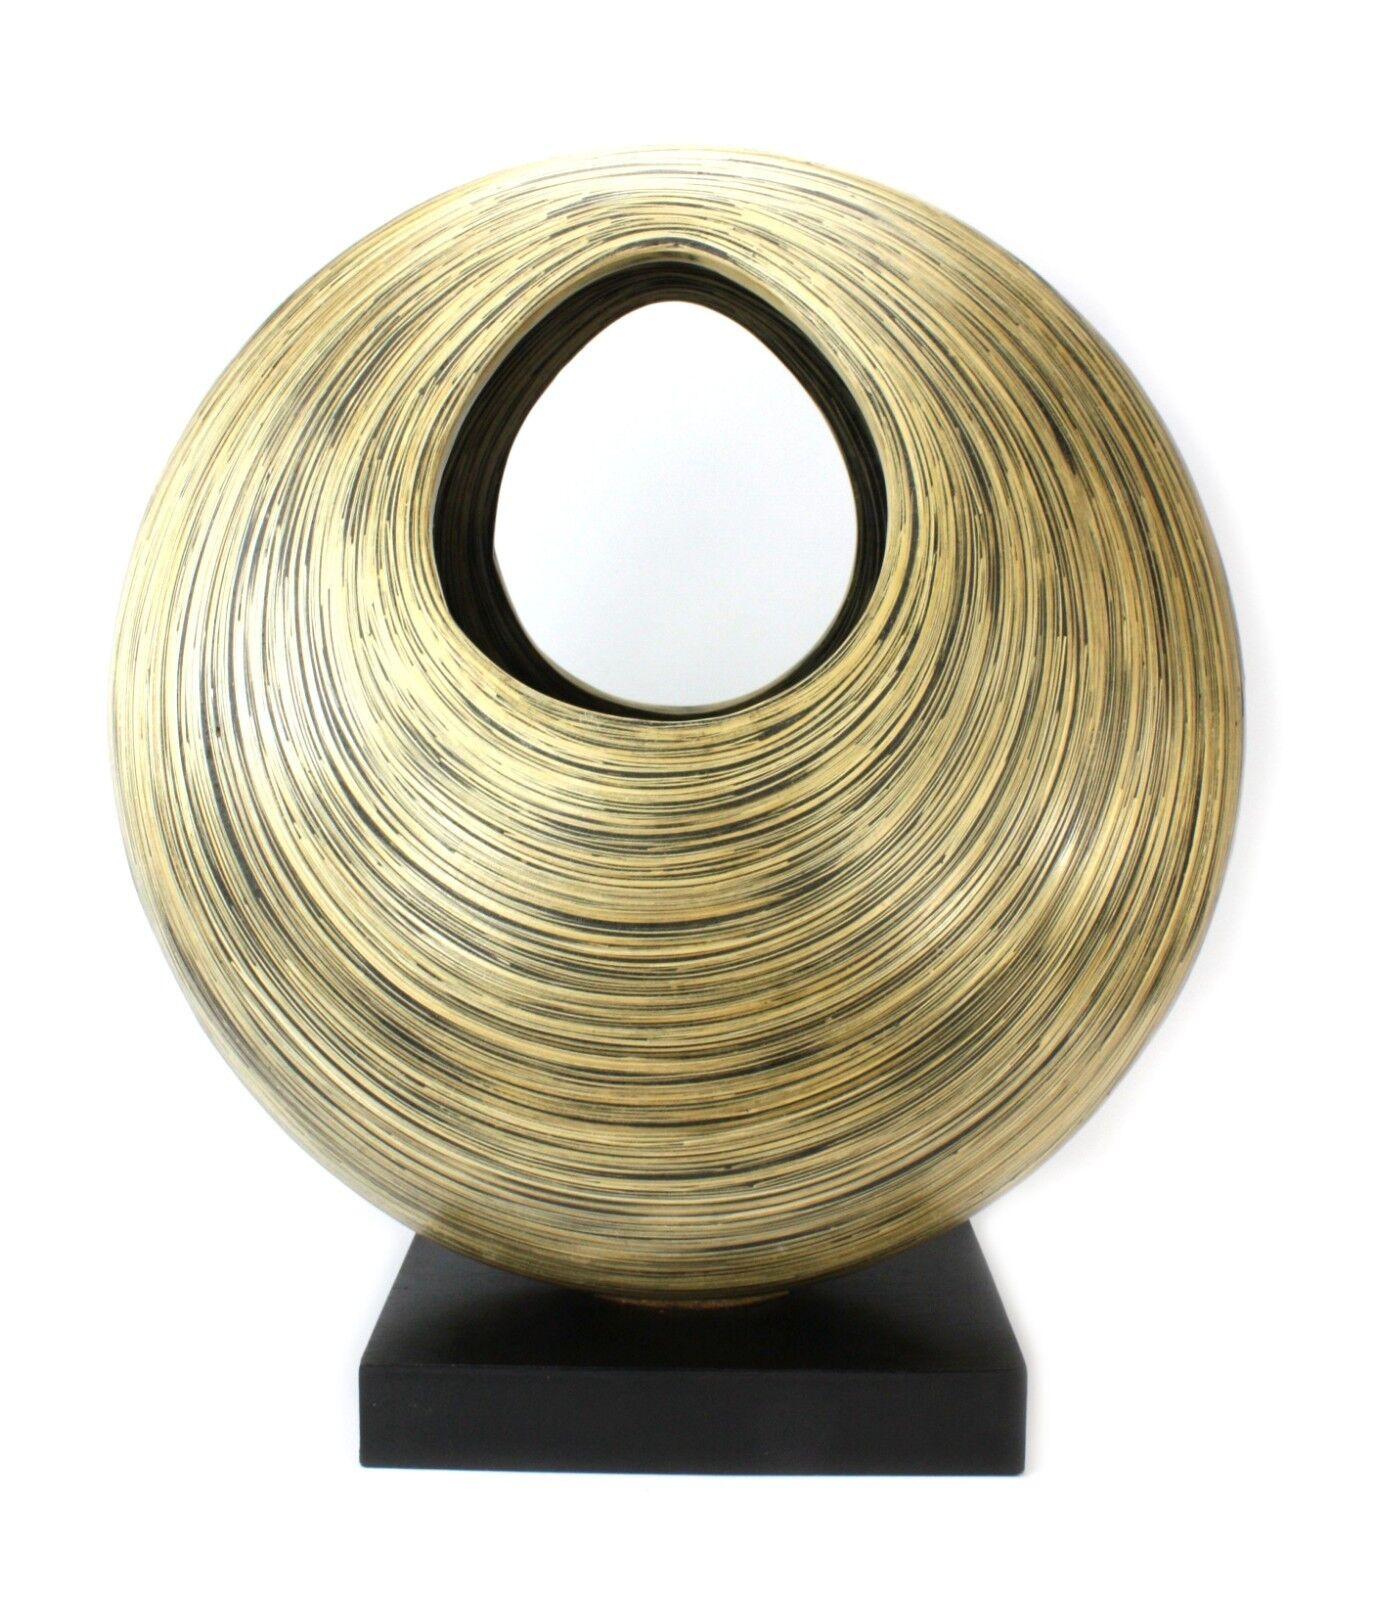 Thai Bamboo Lacquerware, decorative sculpture, 62cm high. Handmade in Thailand.